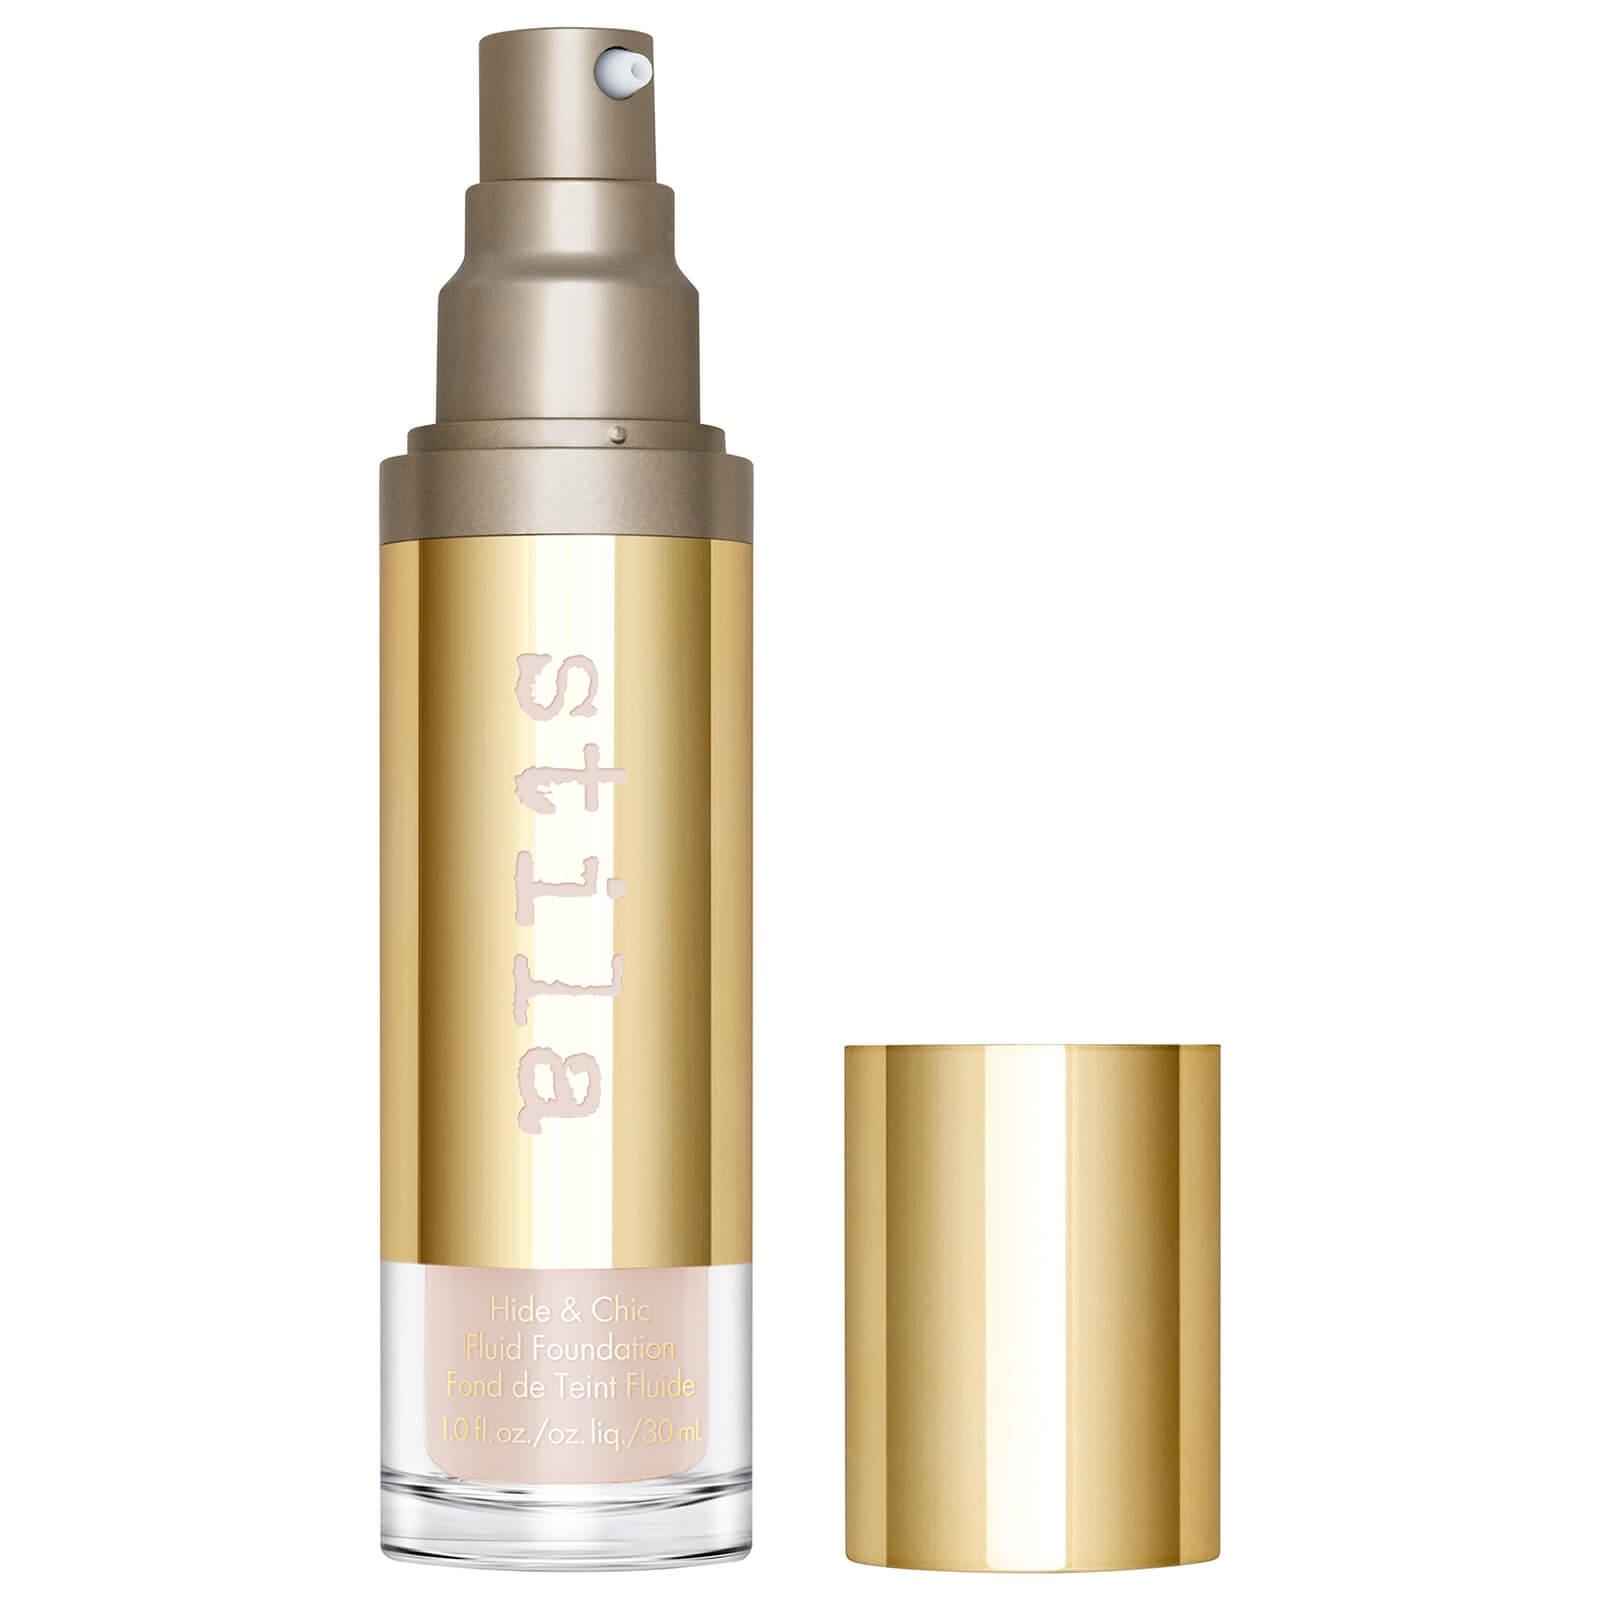 Купить Stila Hide and Chic Fluid Foundation 30ml (Various Shades) - Light 3